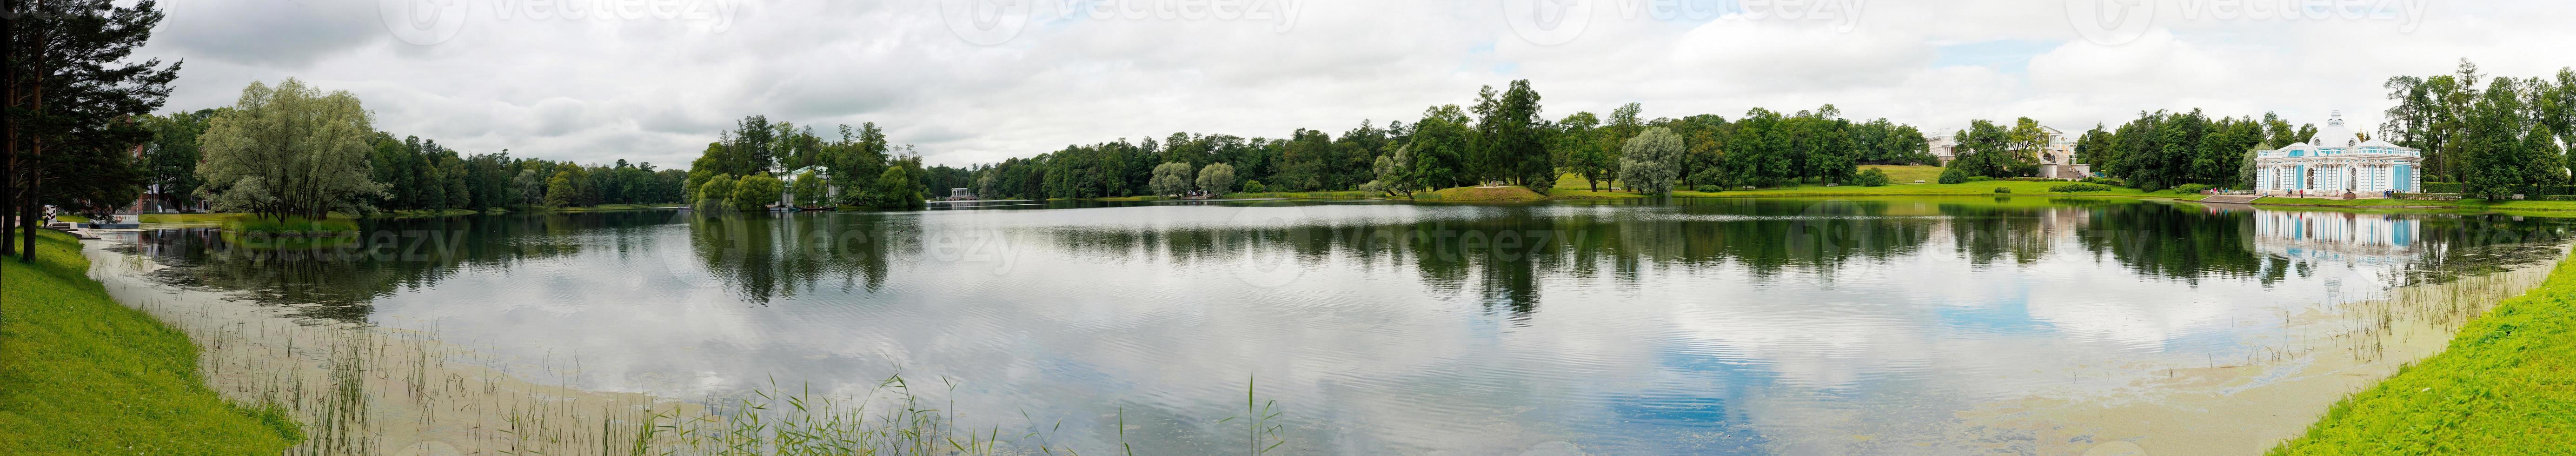 Lake panorama in Catherine Park 1168. photo